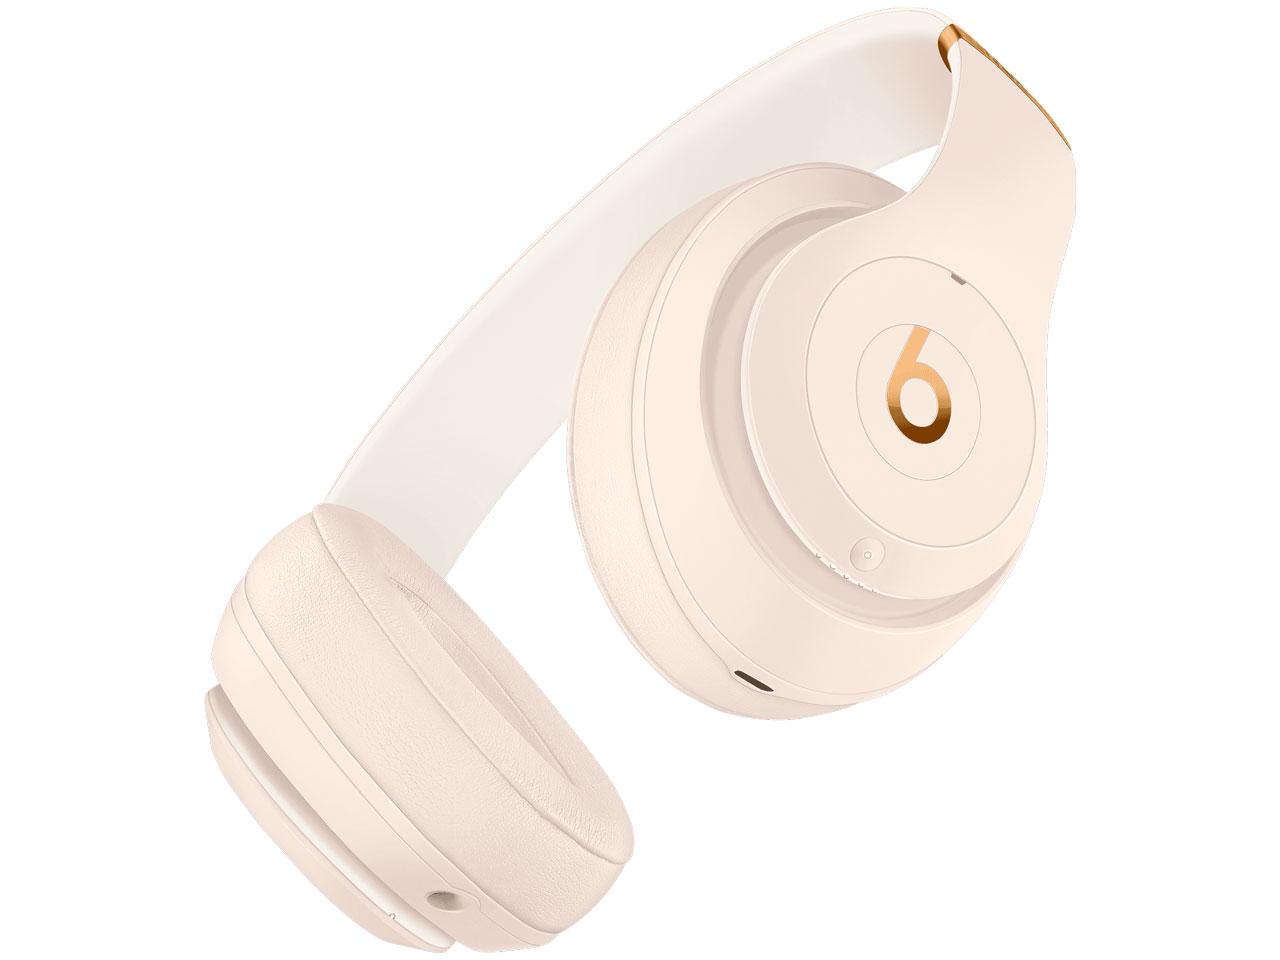 studio3 wireless MQUG2PA/A [ポーセリンローズ] の製品画像